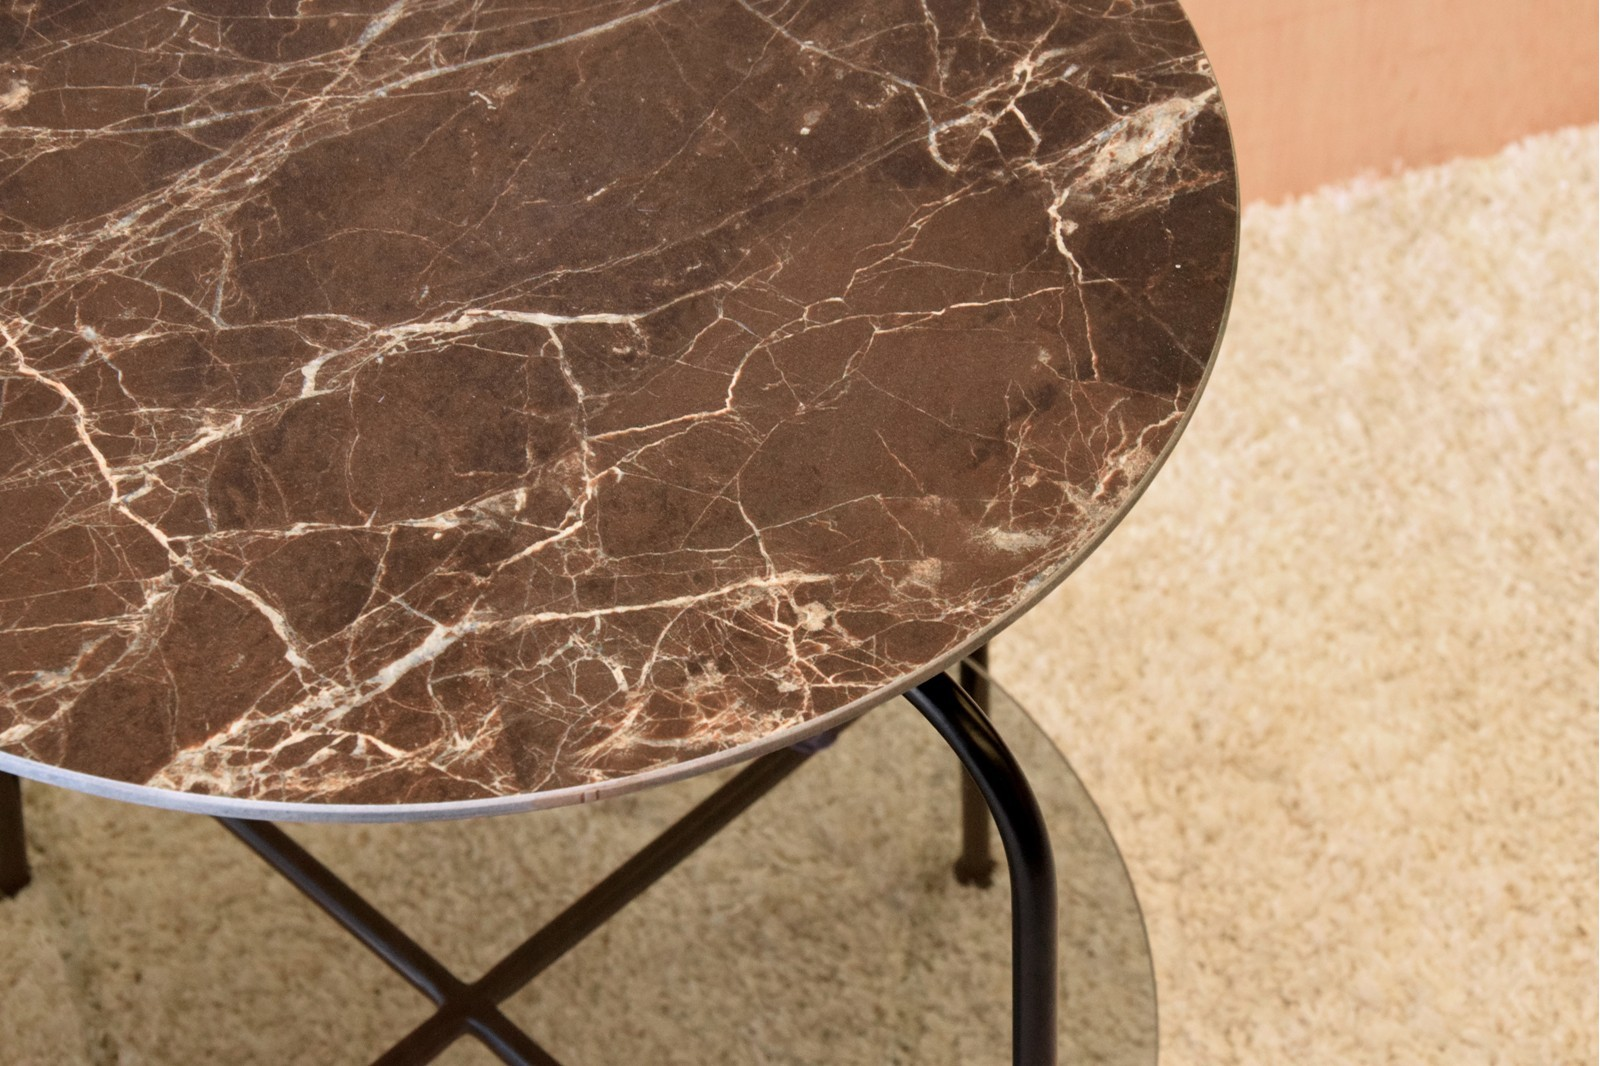 SIDE TABLE CERAMIC TOP GLASS SHELF . BLACK METAL